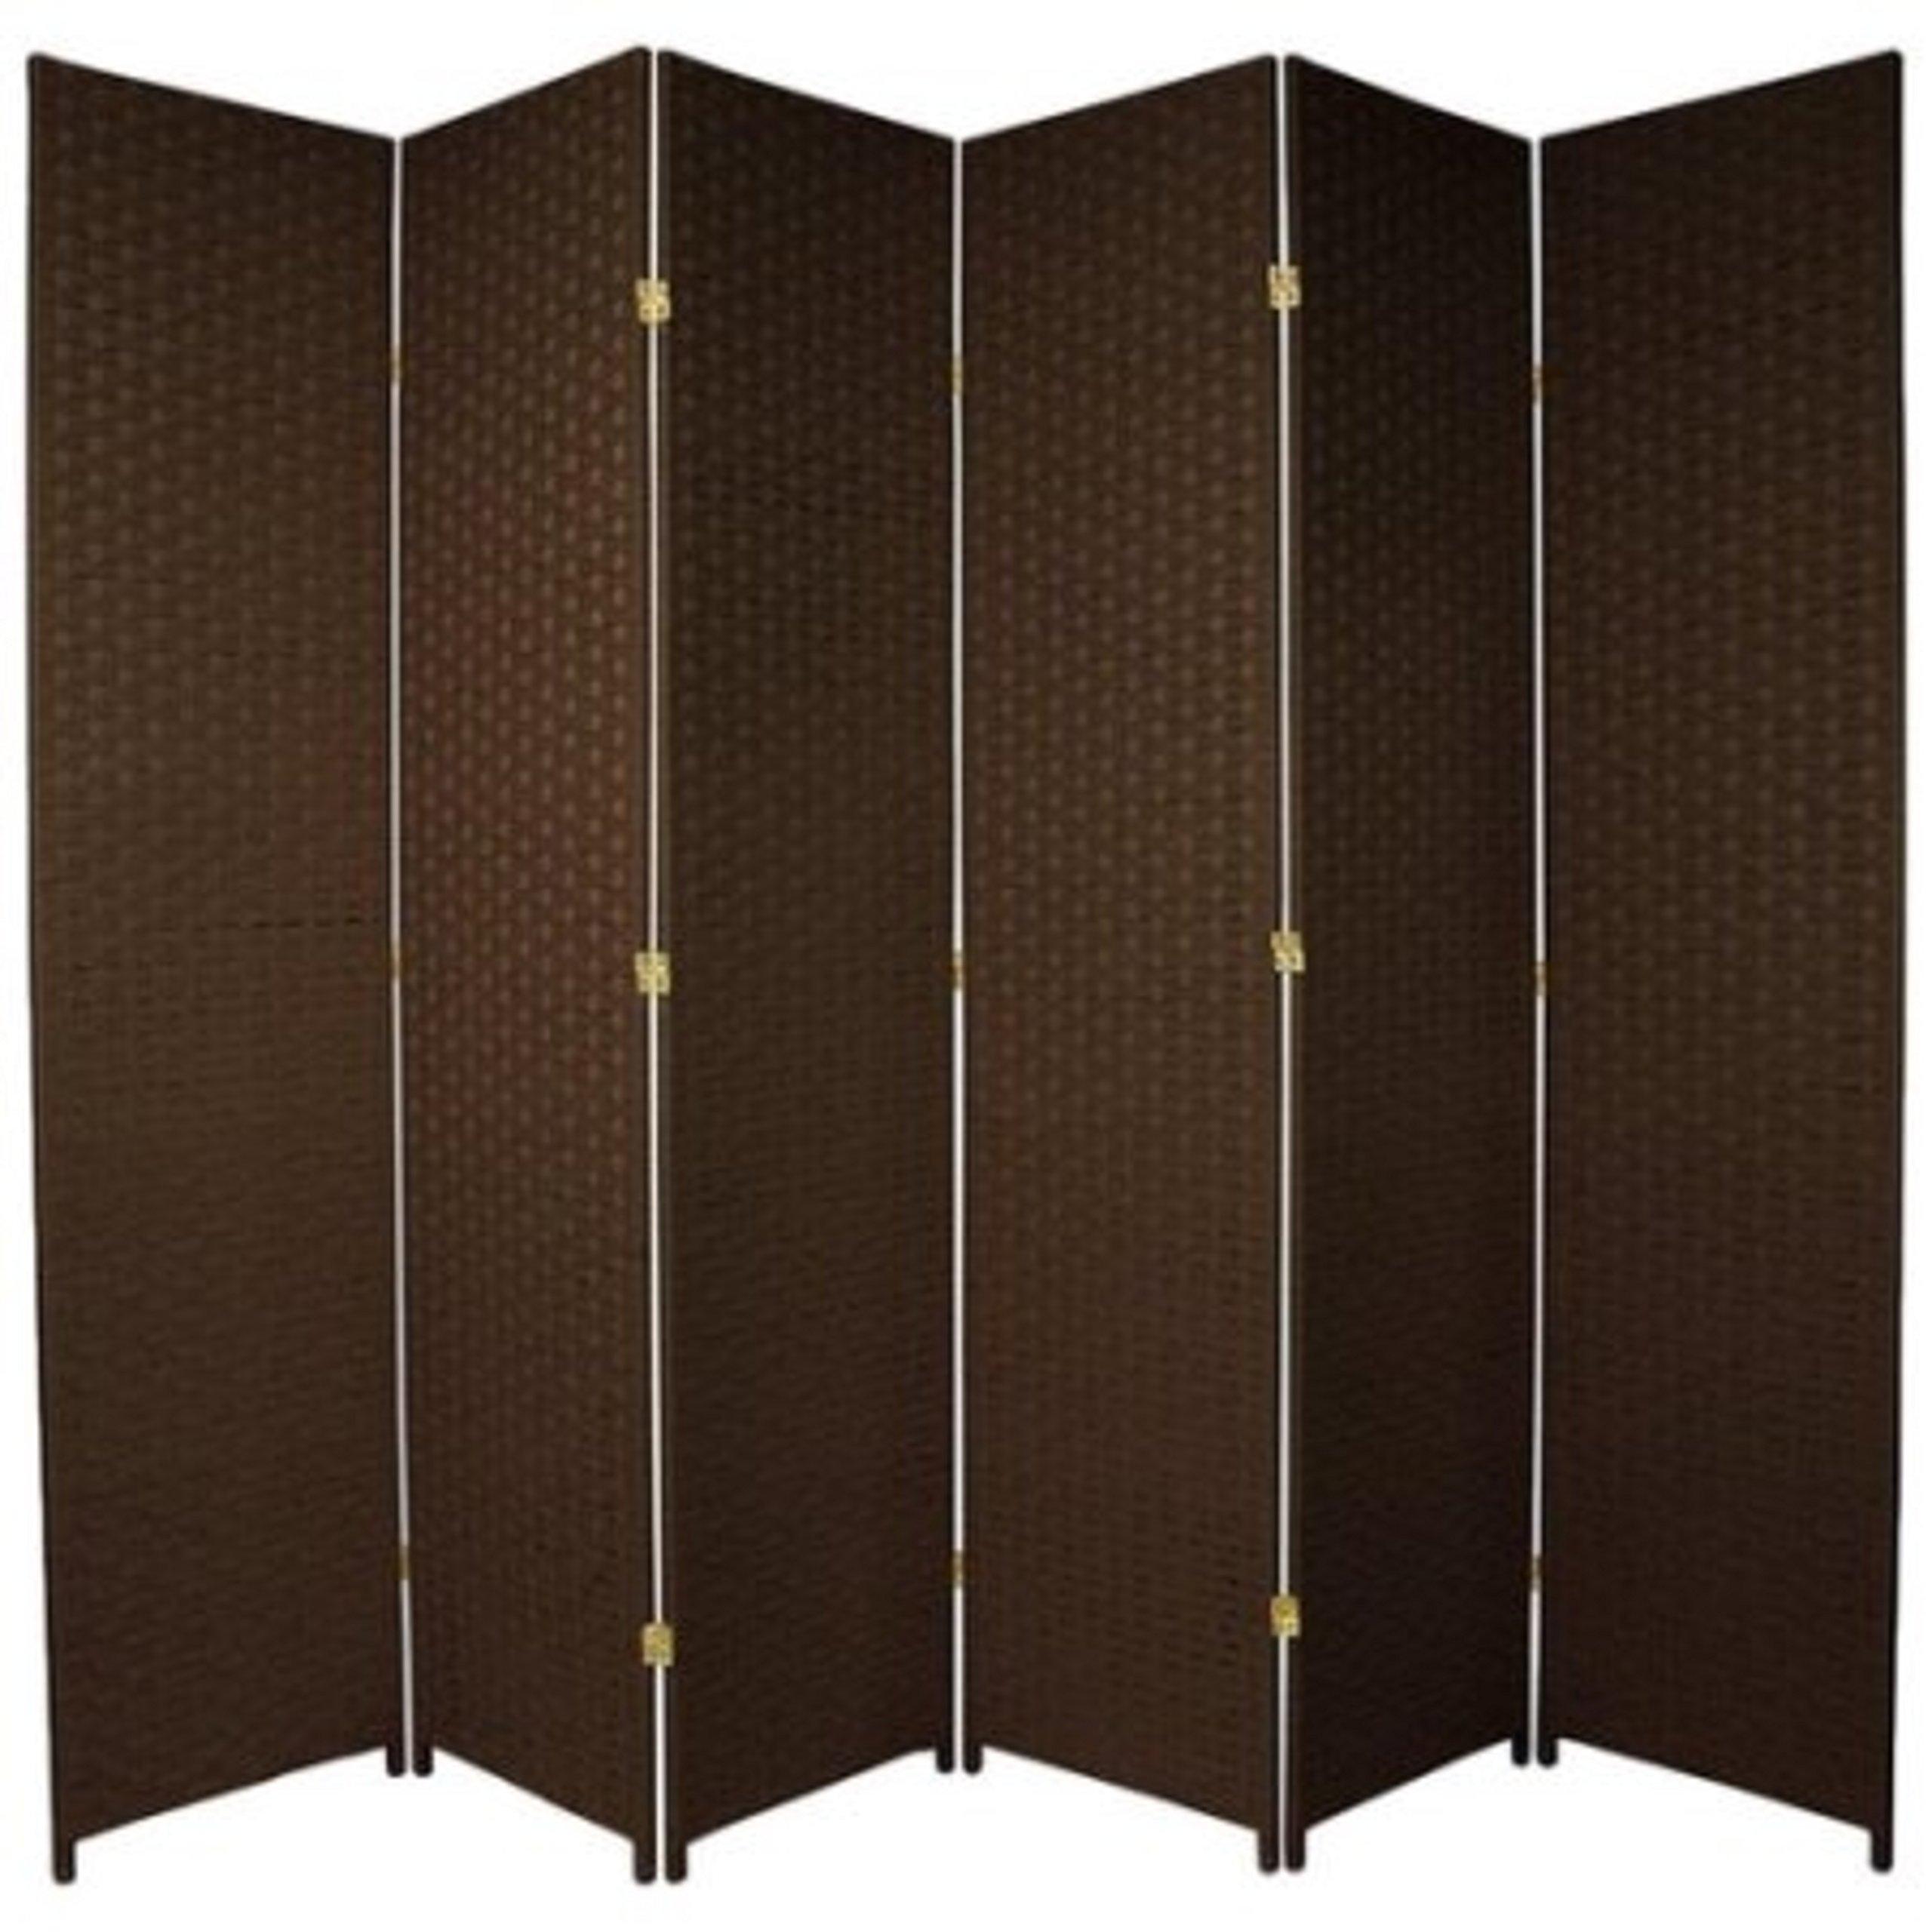 Natural Plant Fiber Woven Room Decor Dark Mocha 6 Panels Divider